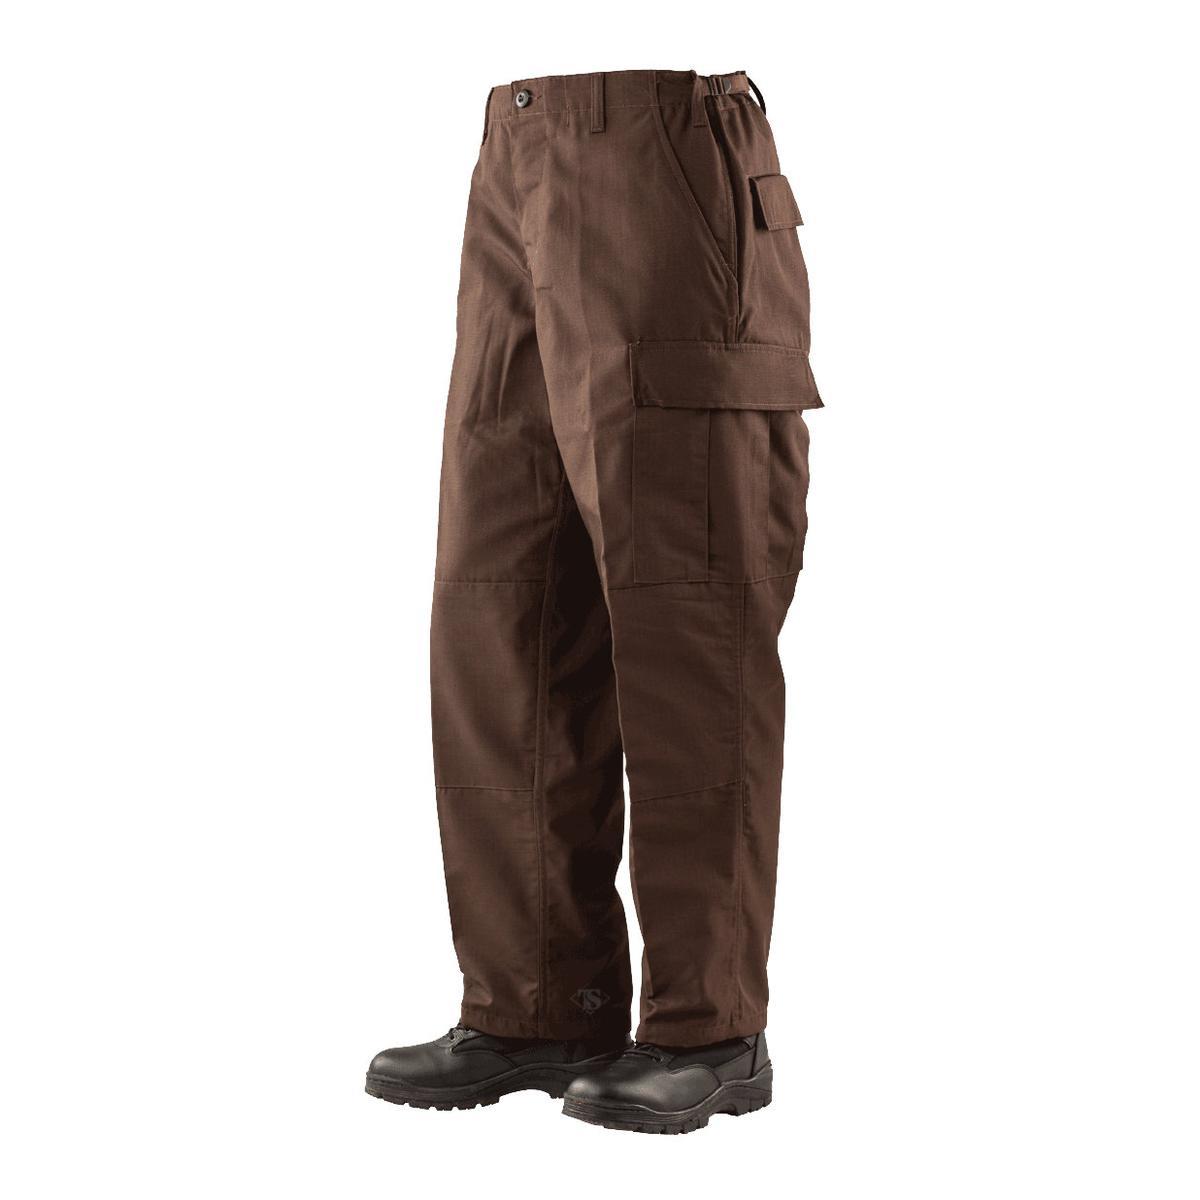 Tru-Spec 1343 Mens BDU Pants, Poly/Cotton Rip-Stop, Brown